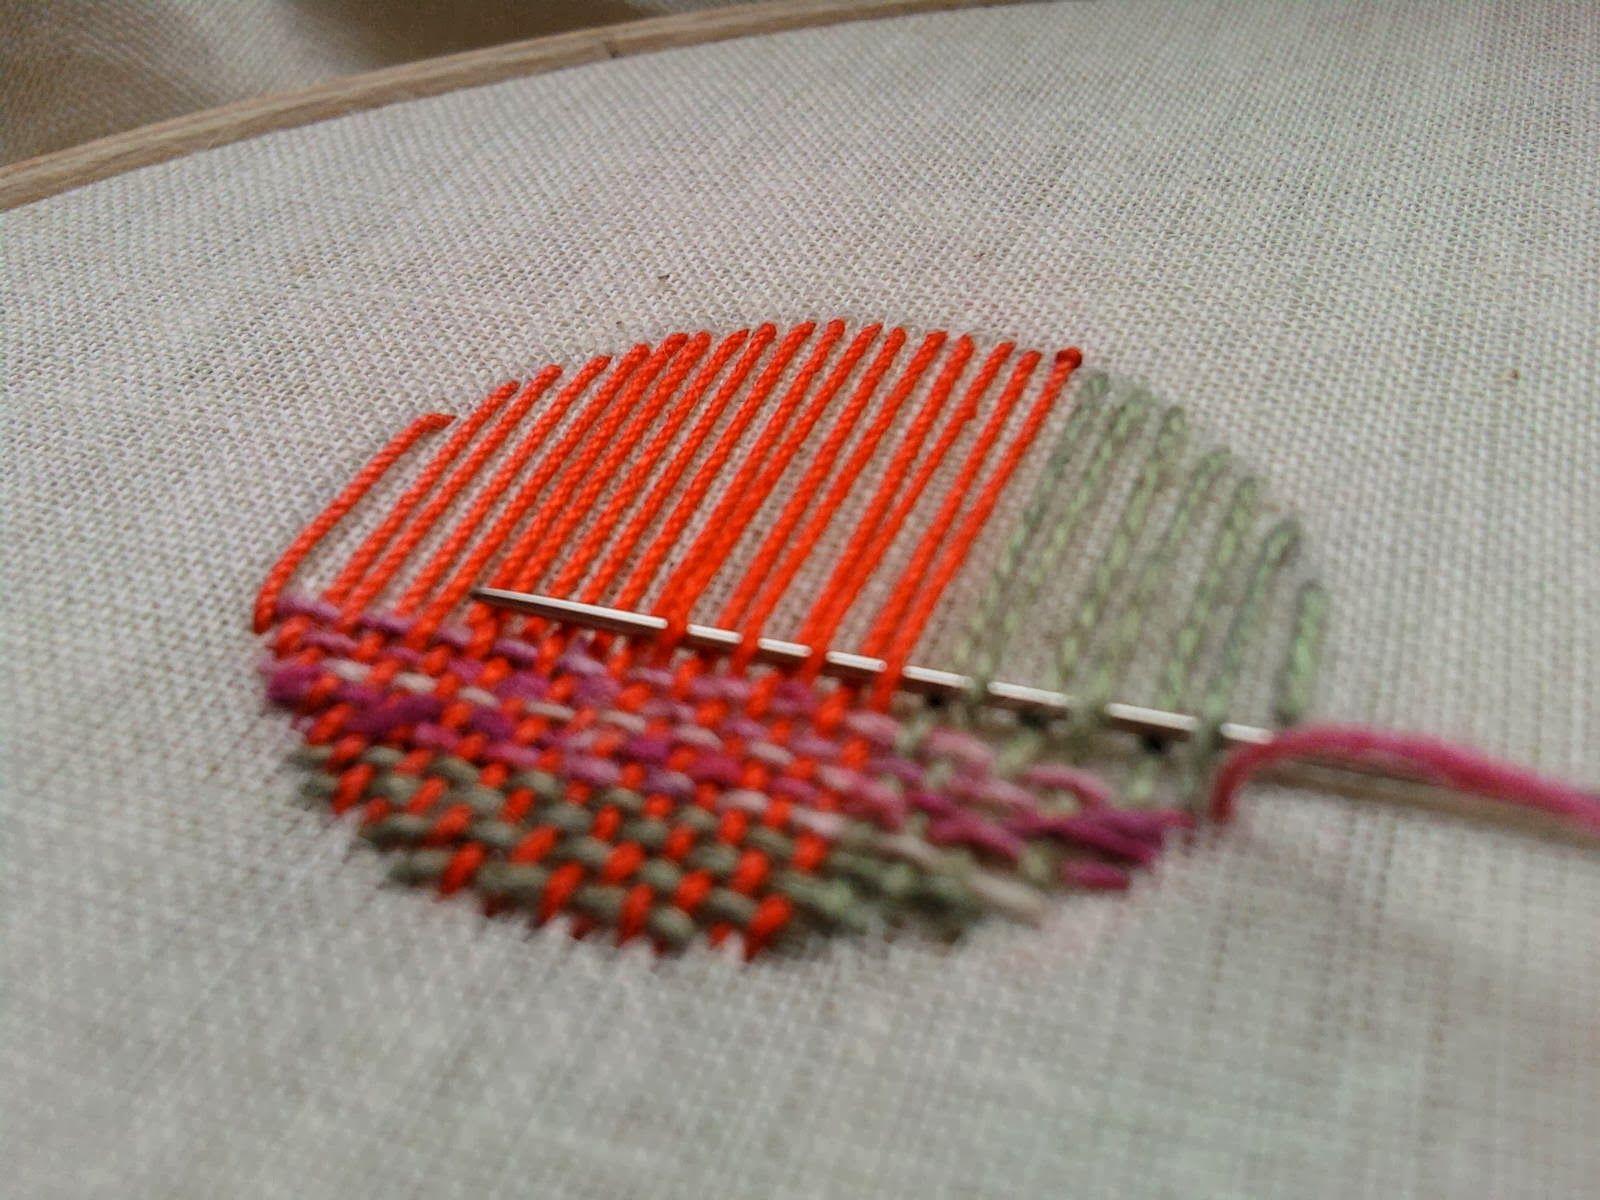 Deshilachado sultrystitch pinterest embroidery stitch and